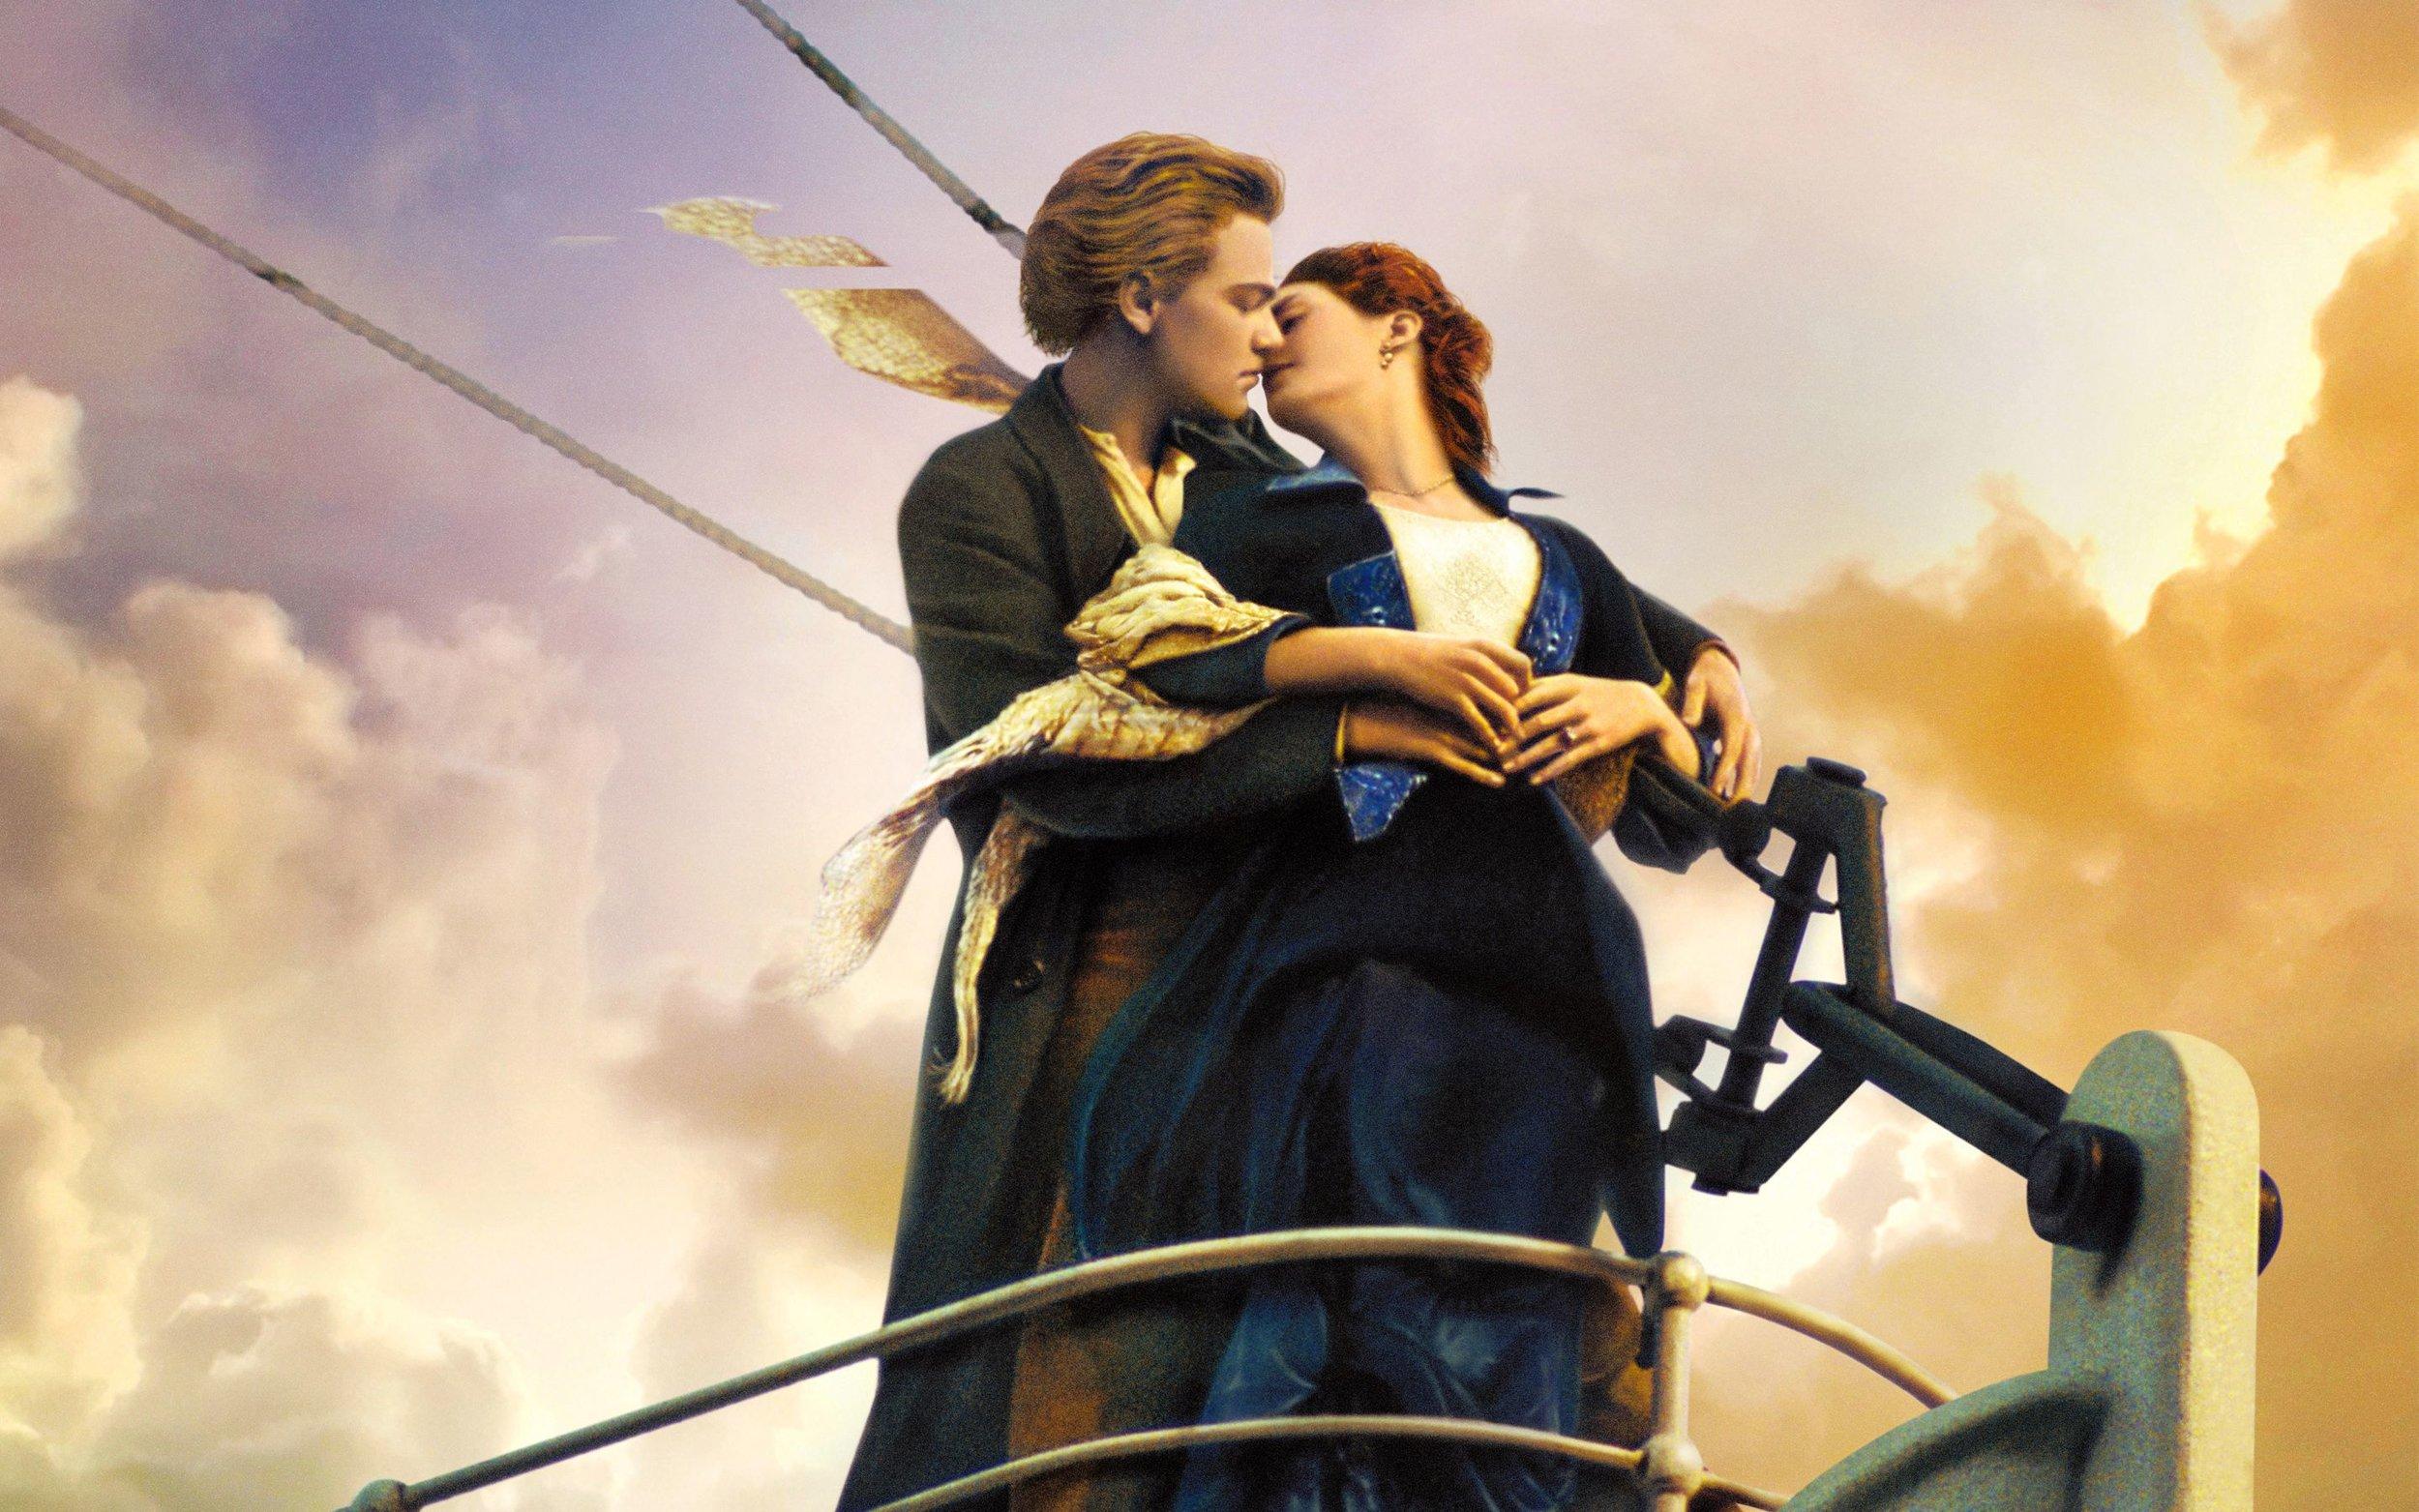 romantic-titanic-kiss-fhd-movie-wallpaper.jpg